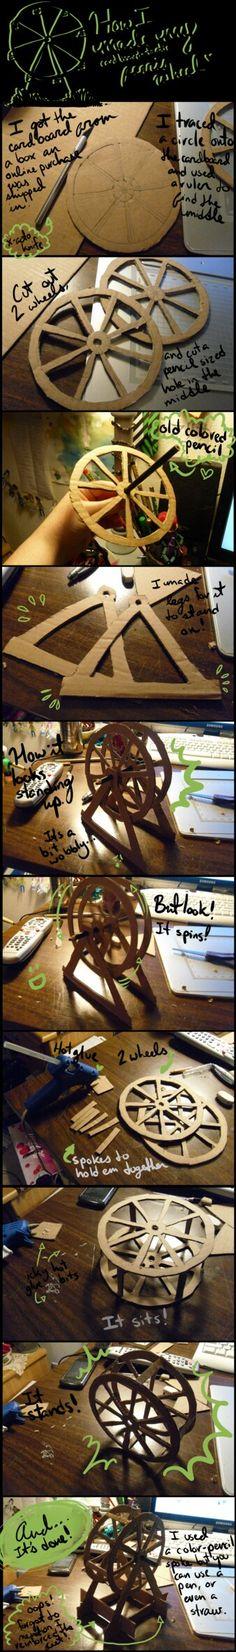 Homemade ferris wheel